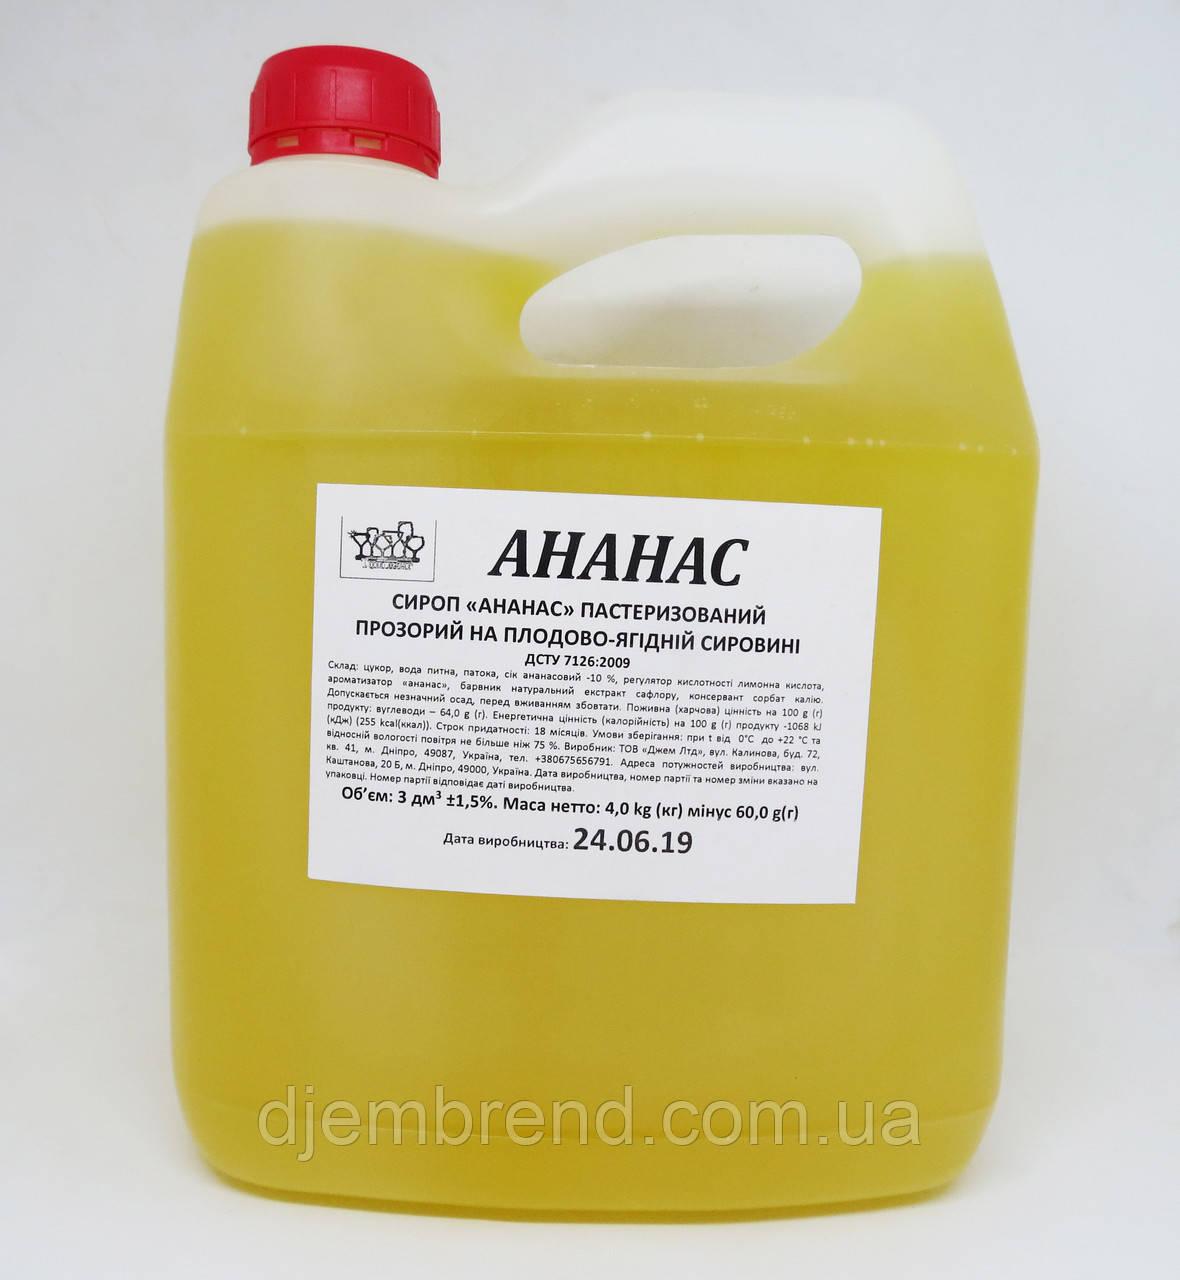 Сироп Ананас в канистре ТМ Топпинг, 3 л/4 кг